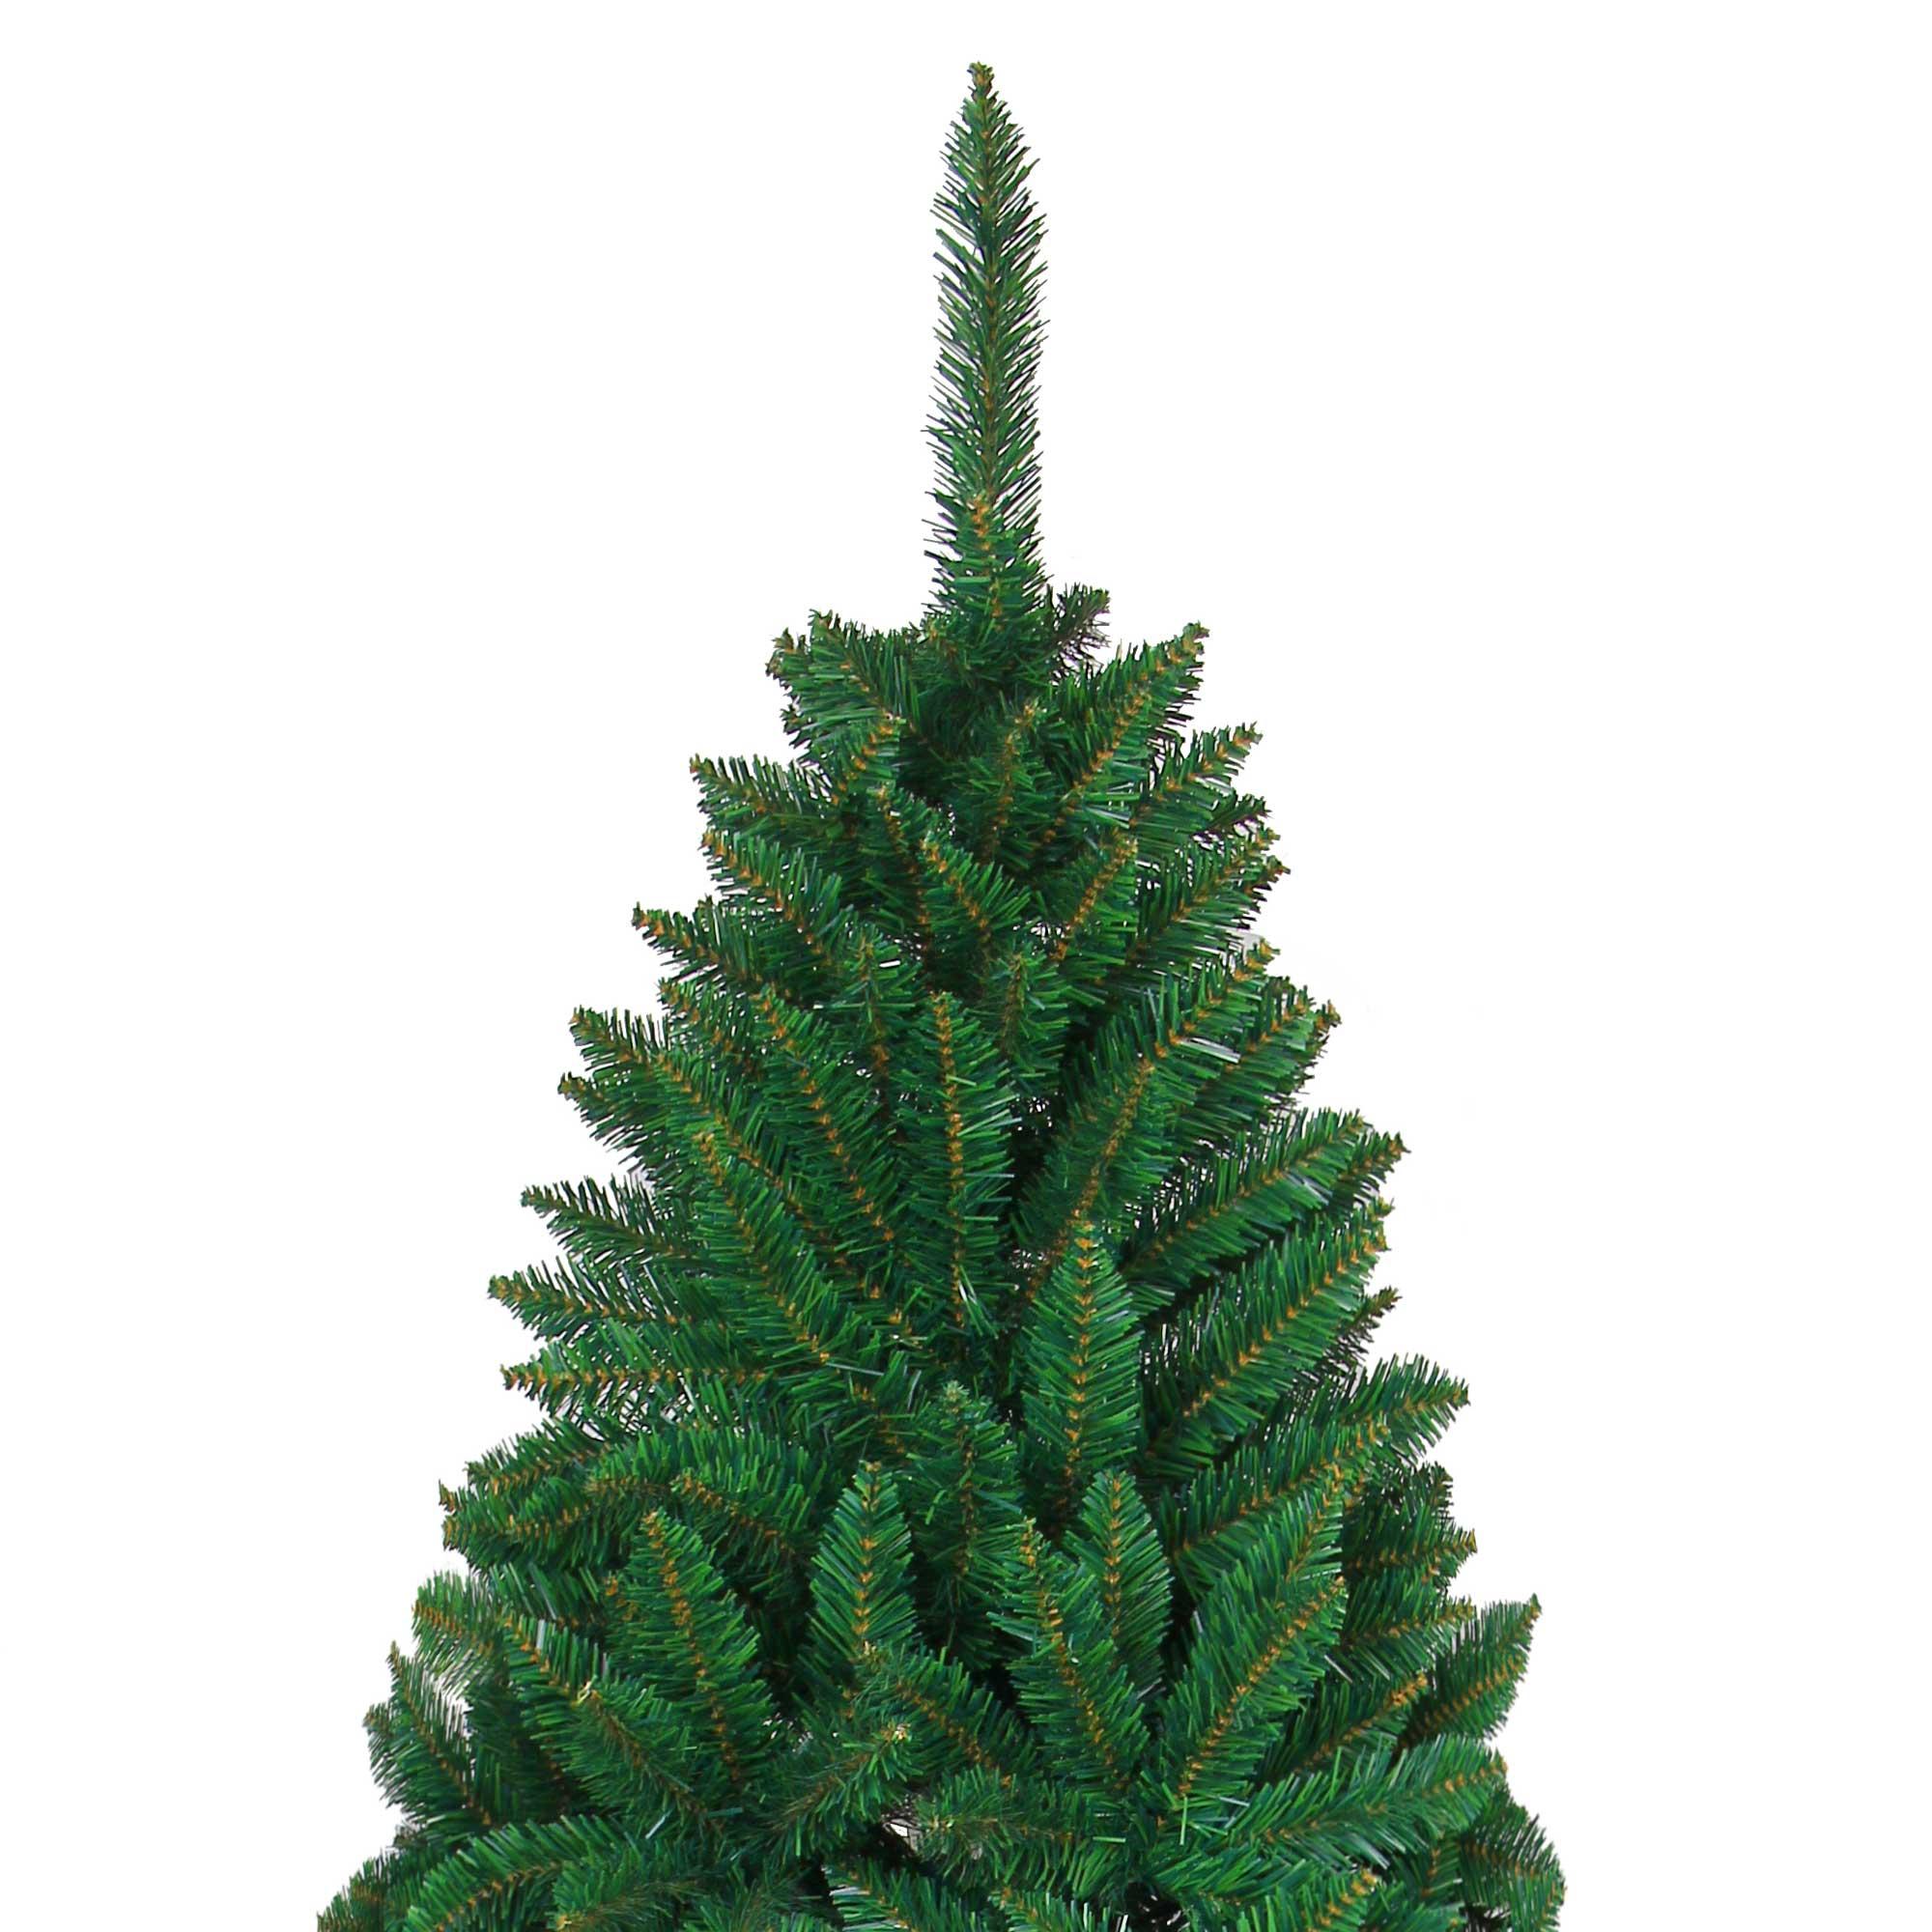 Xmas Tree: Artificial Christmas Tree Green Imperial Pine Deluxe Xmas